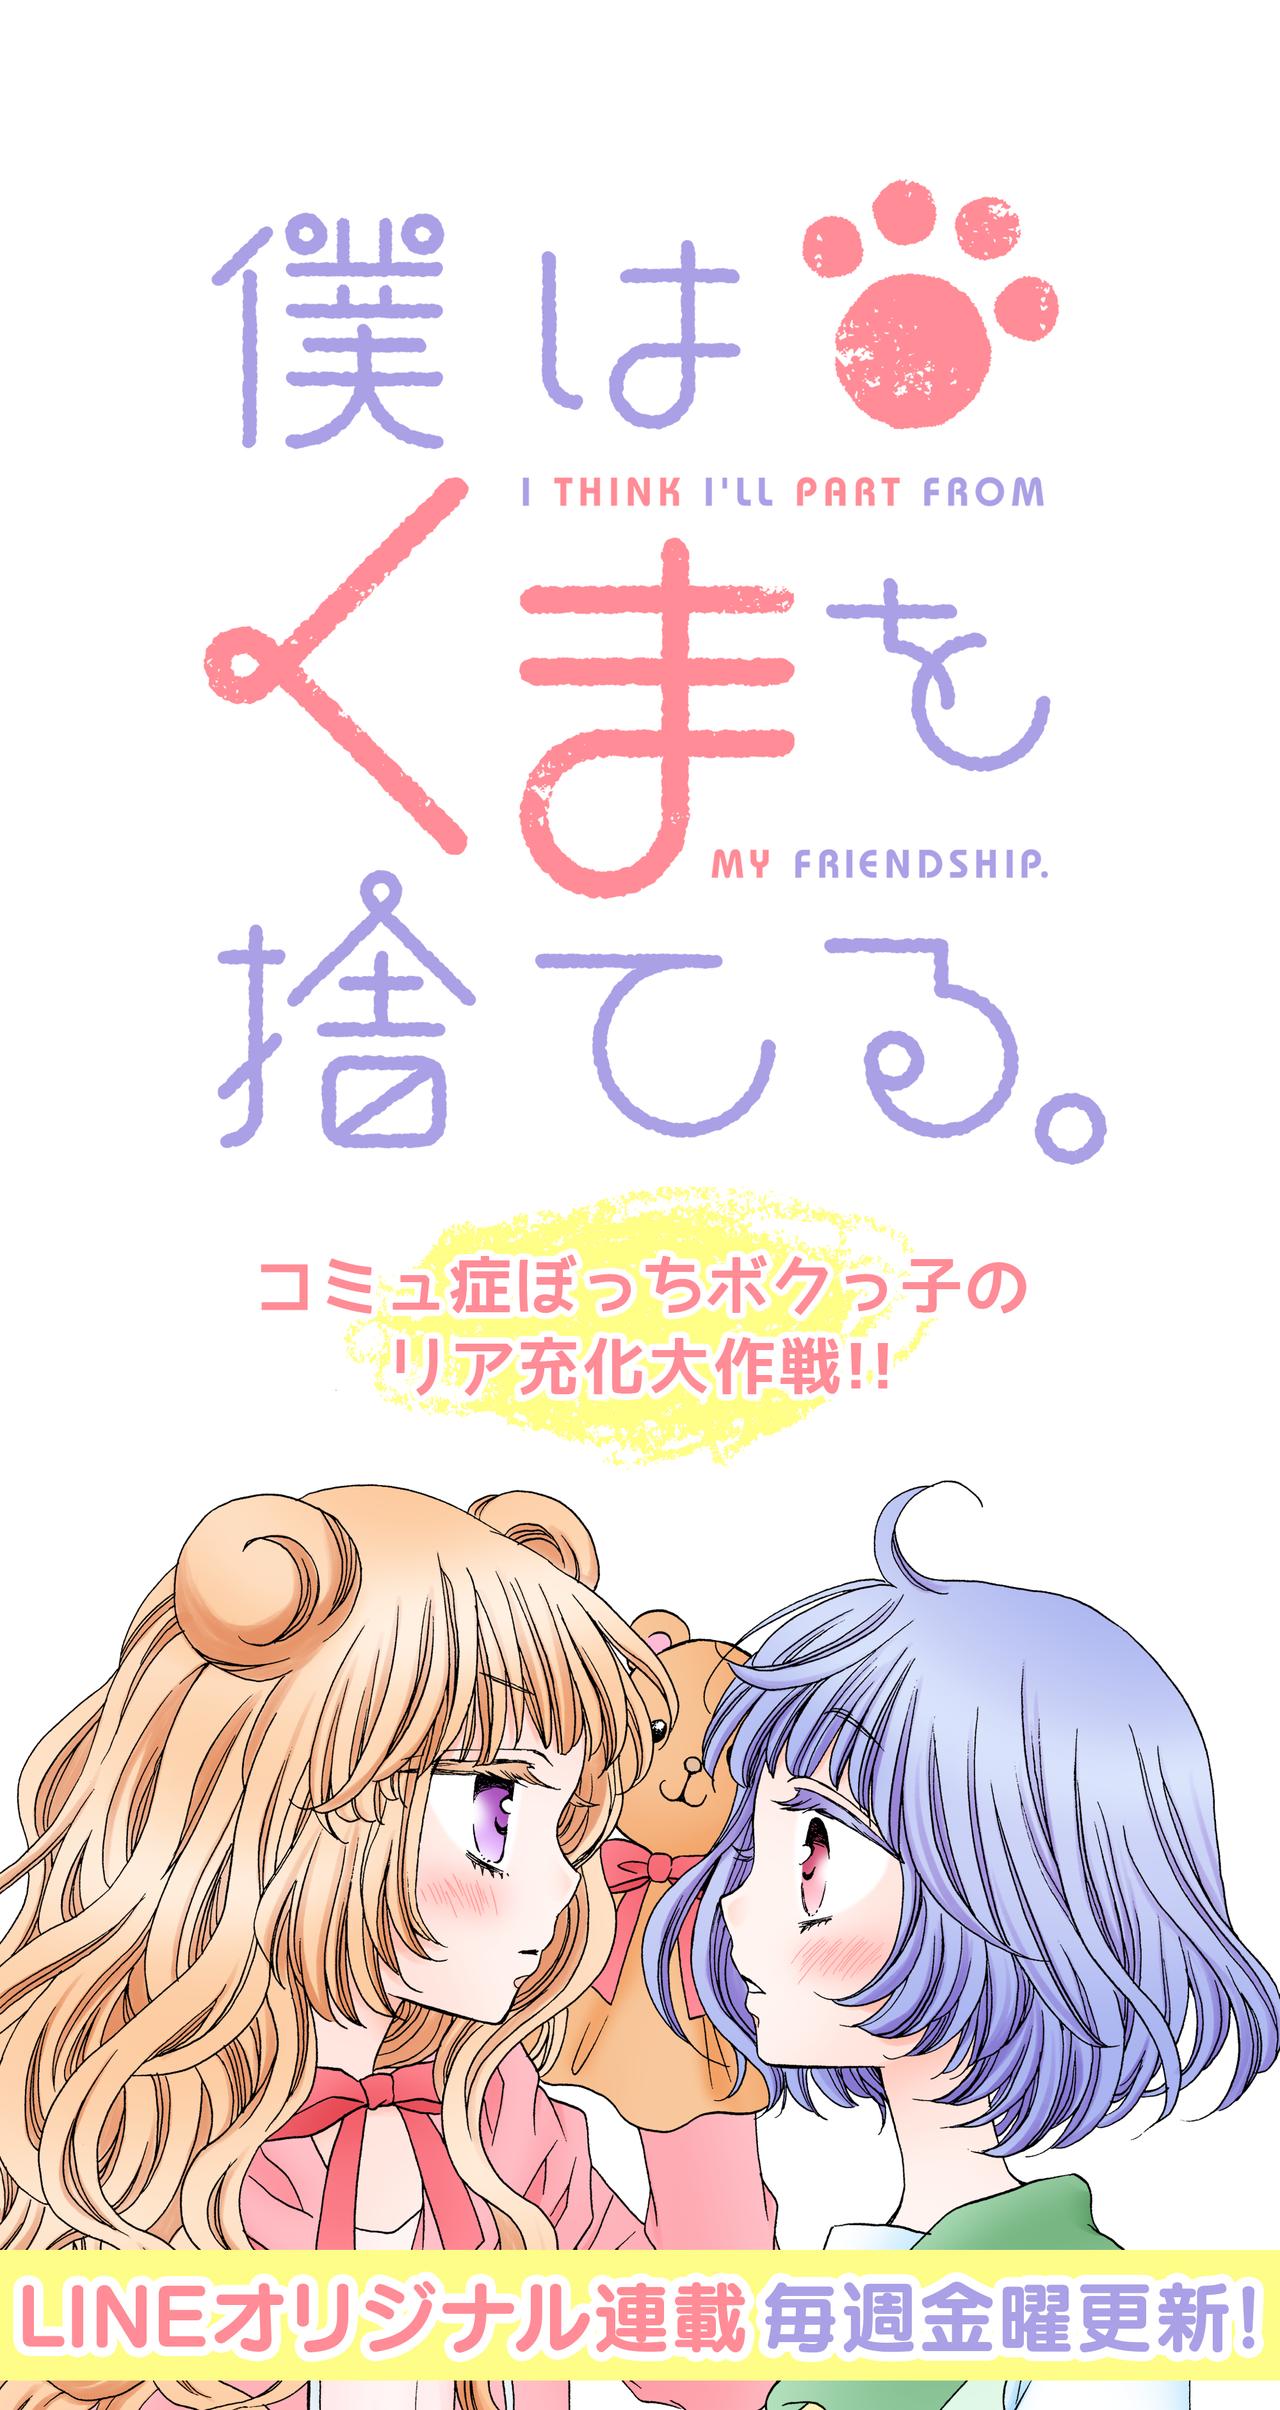 BKS_yokoku_KAKO01 - 02